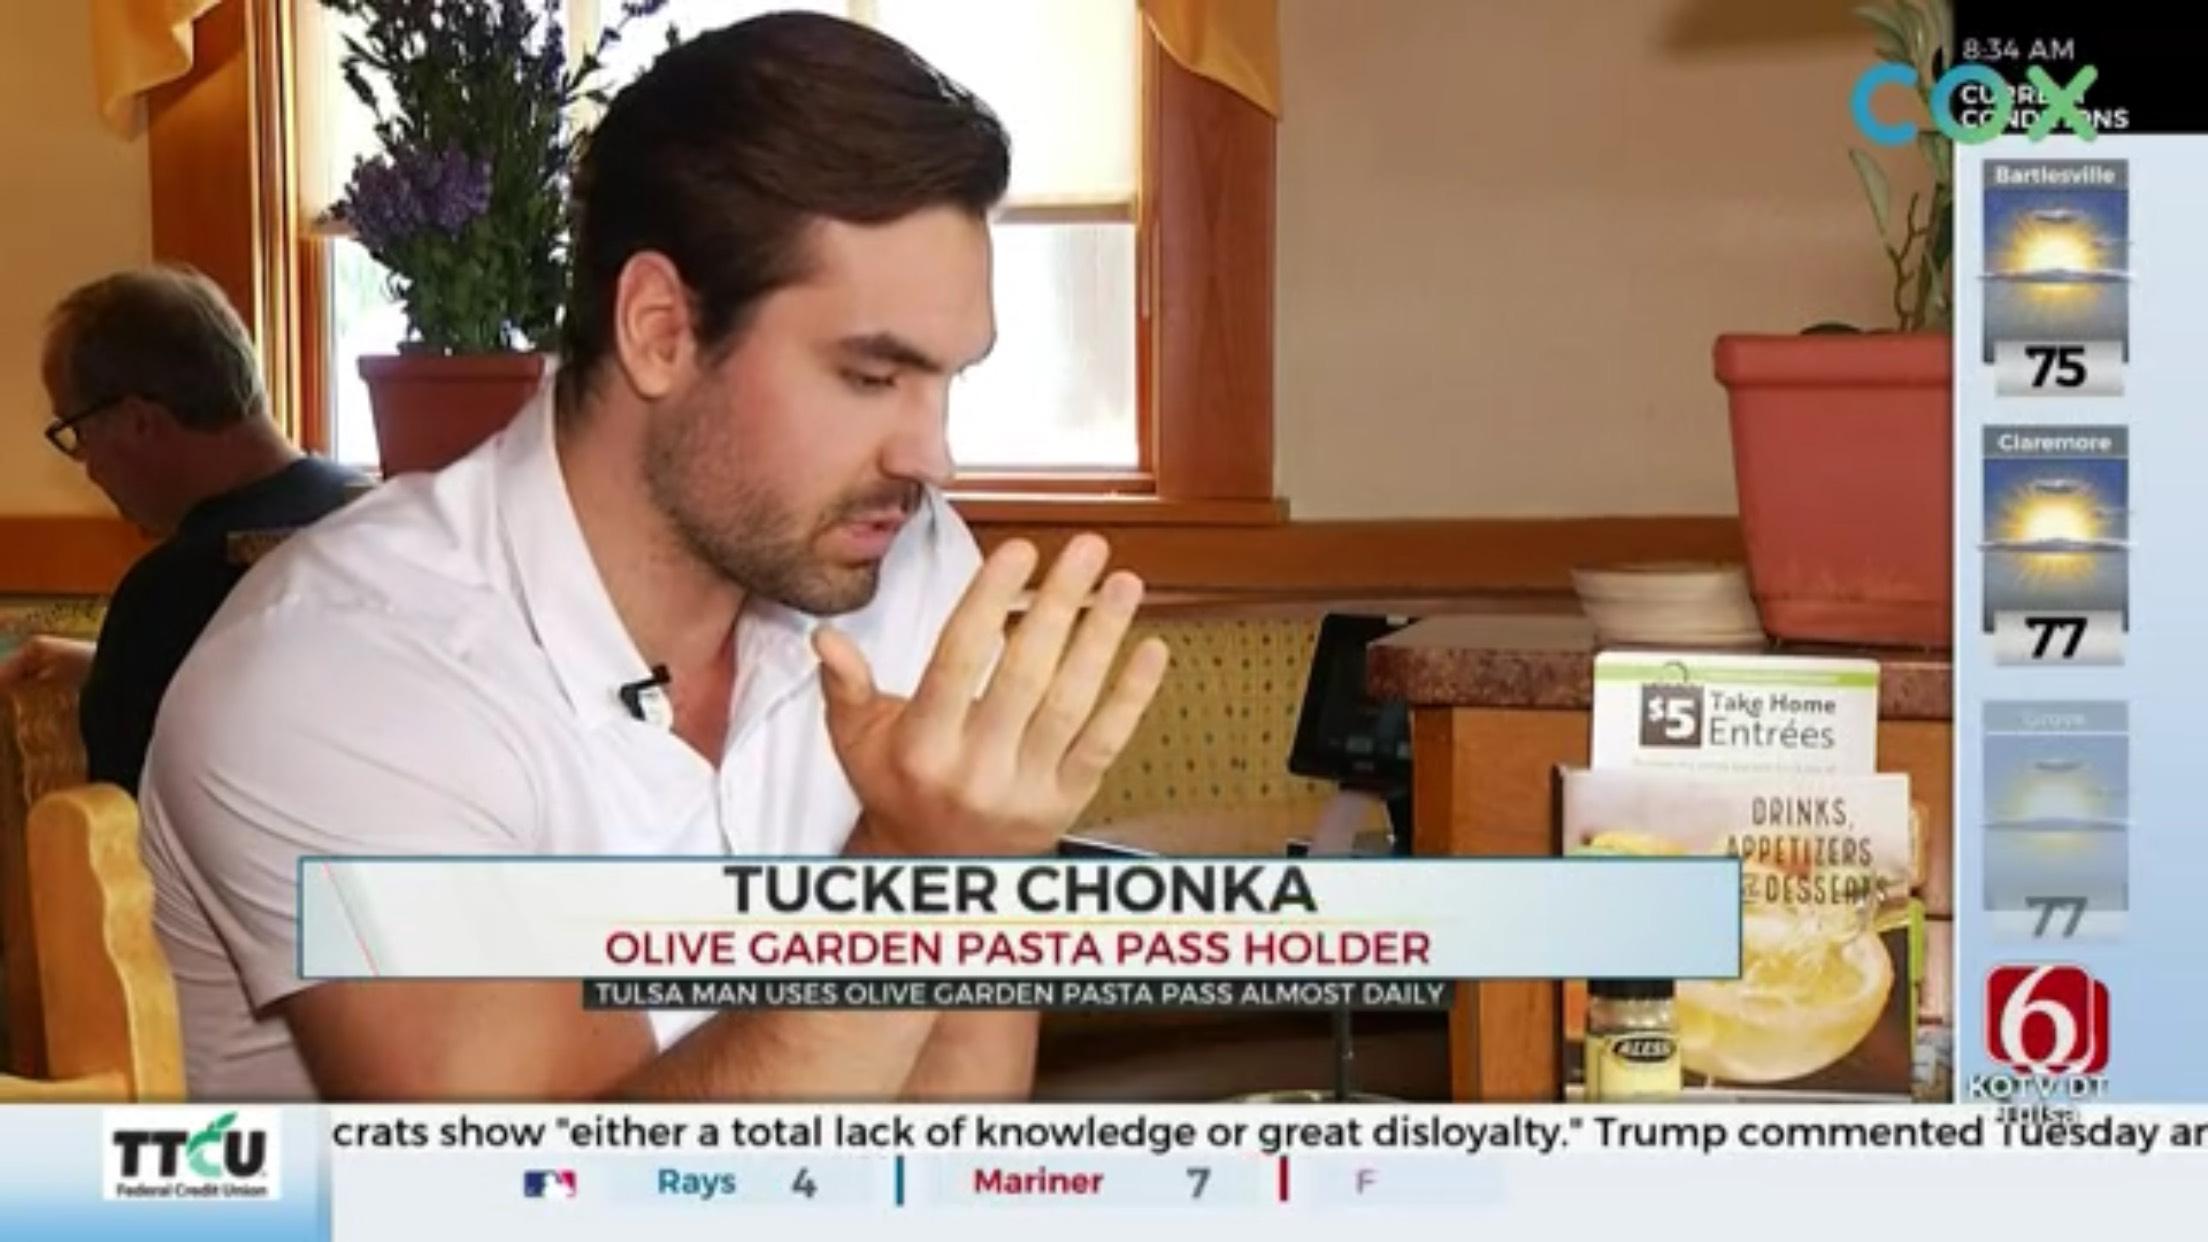 Tucker Chonka: Olive Garden Pasta Pass Holder